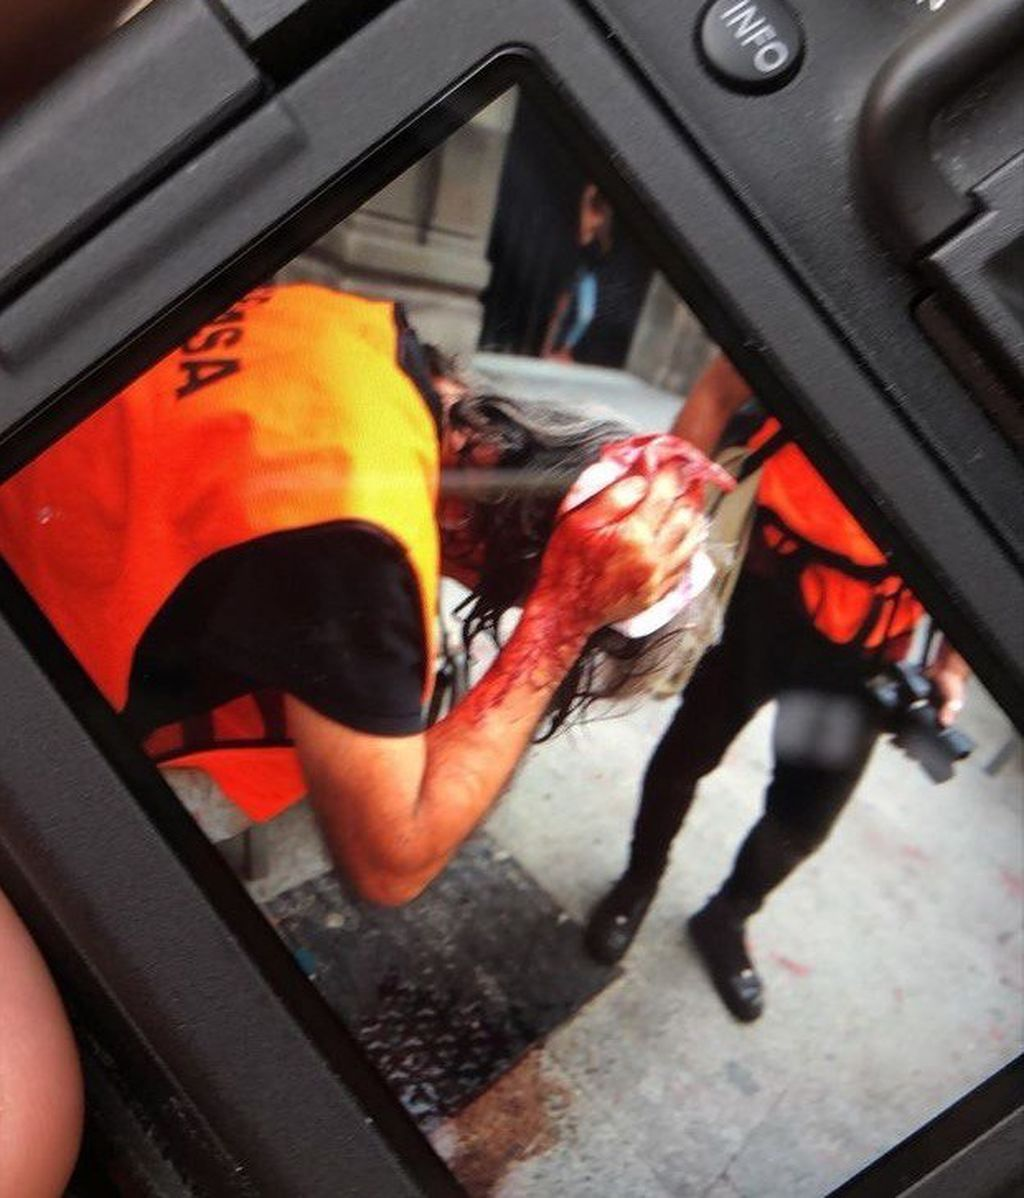 periodista herida